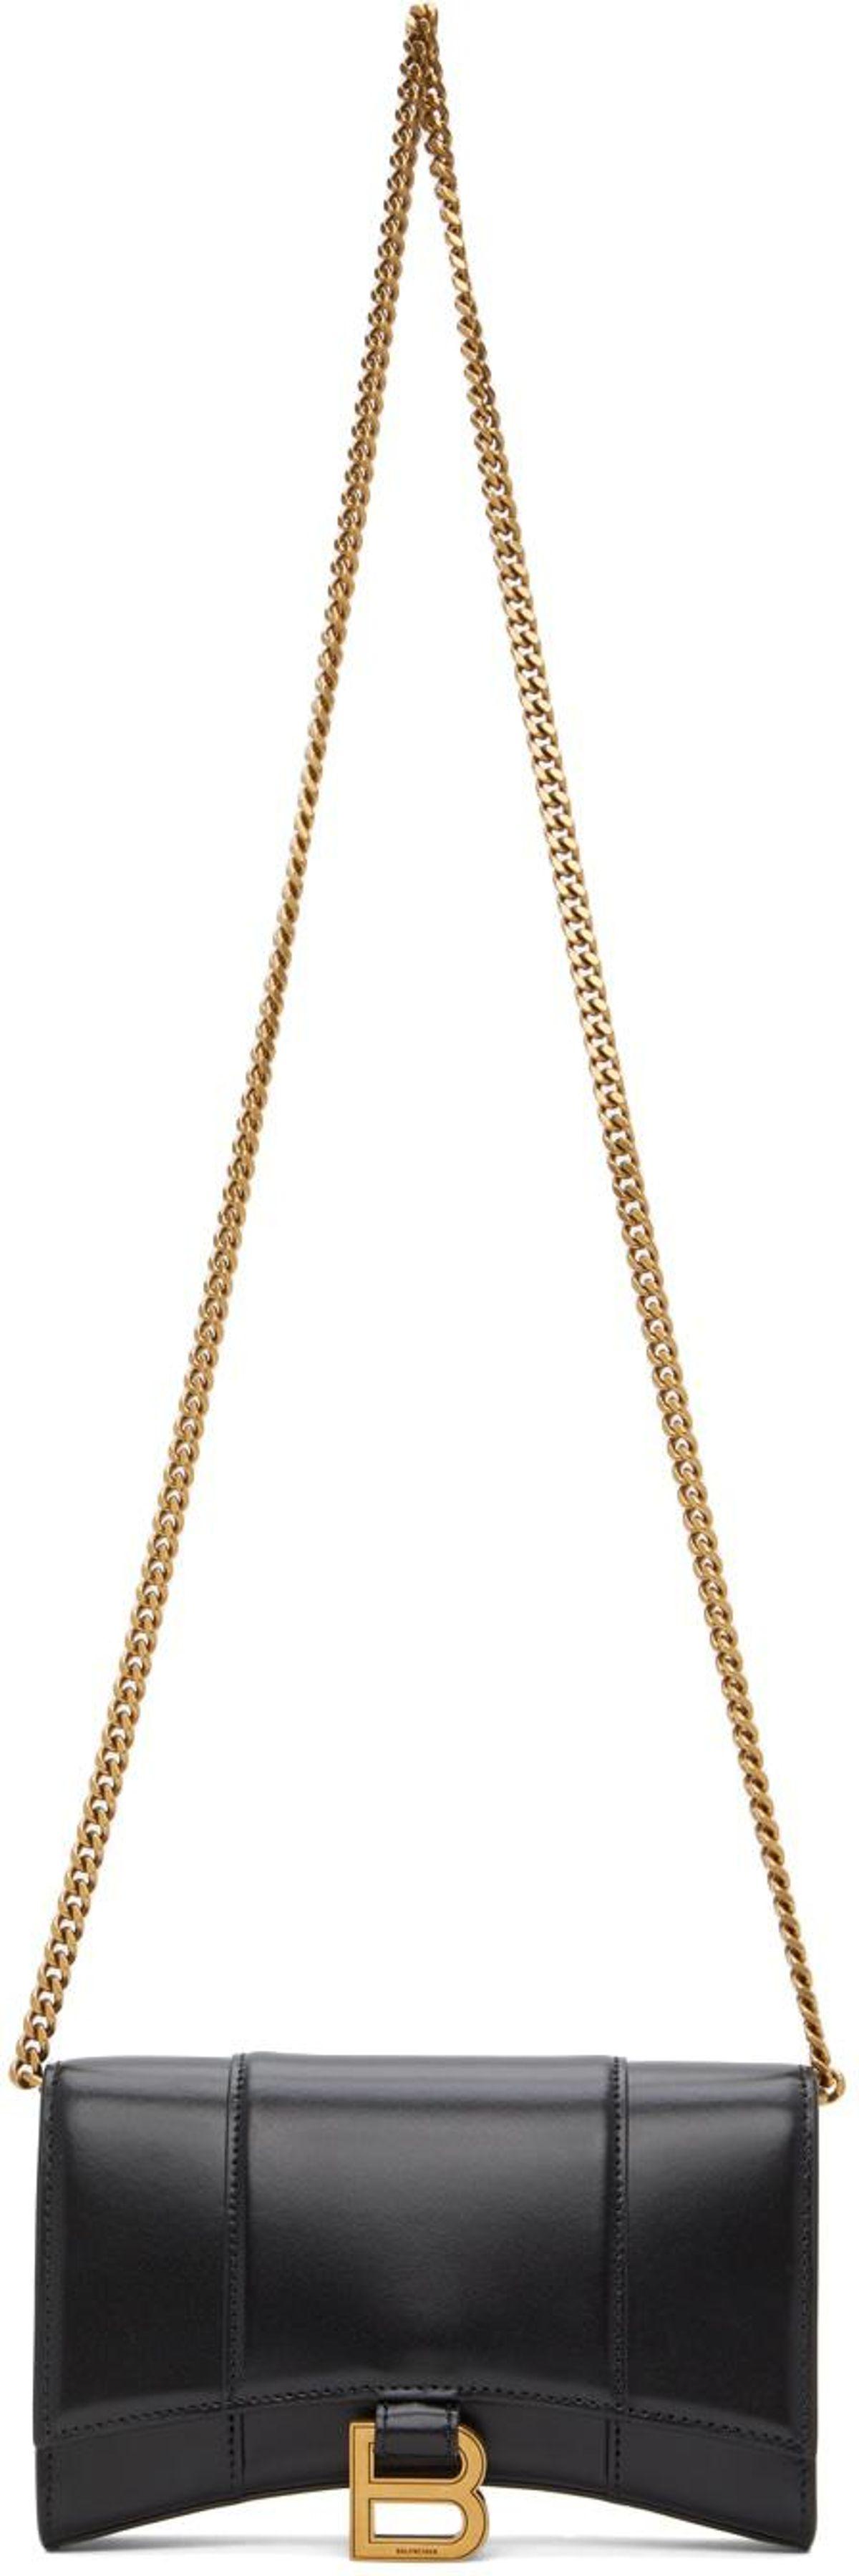 Mini Hourglass Wallet on Chain